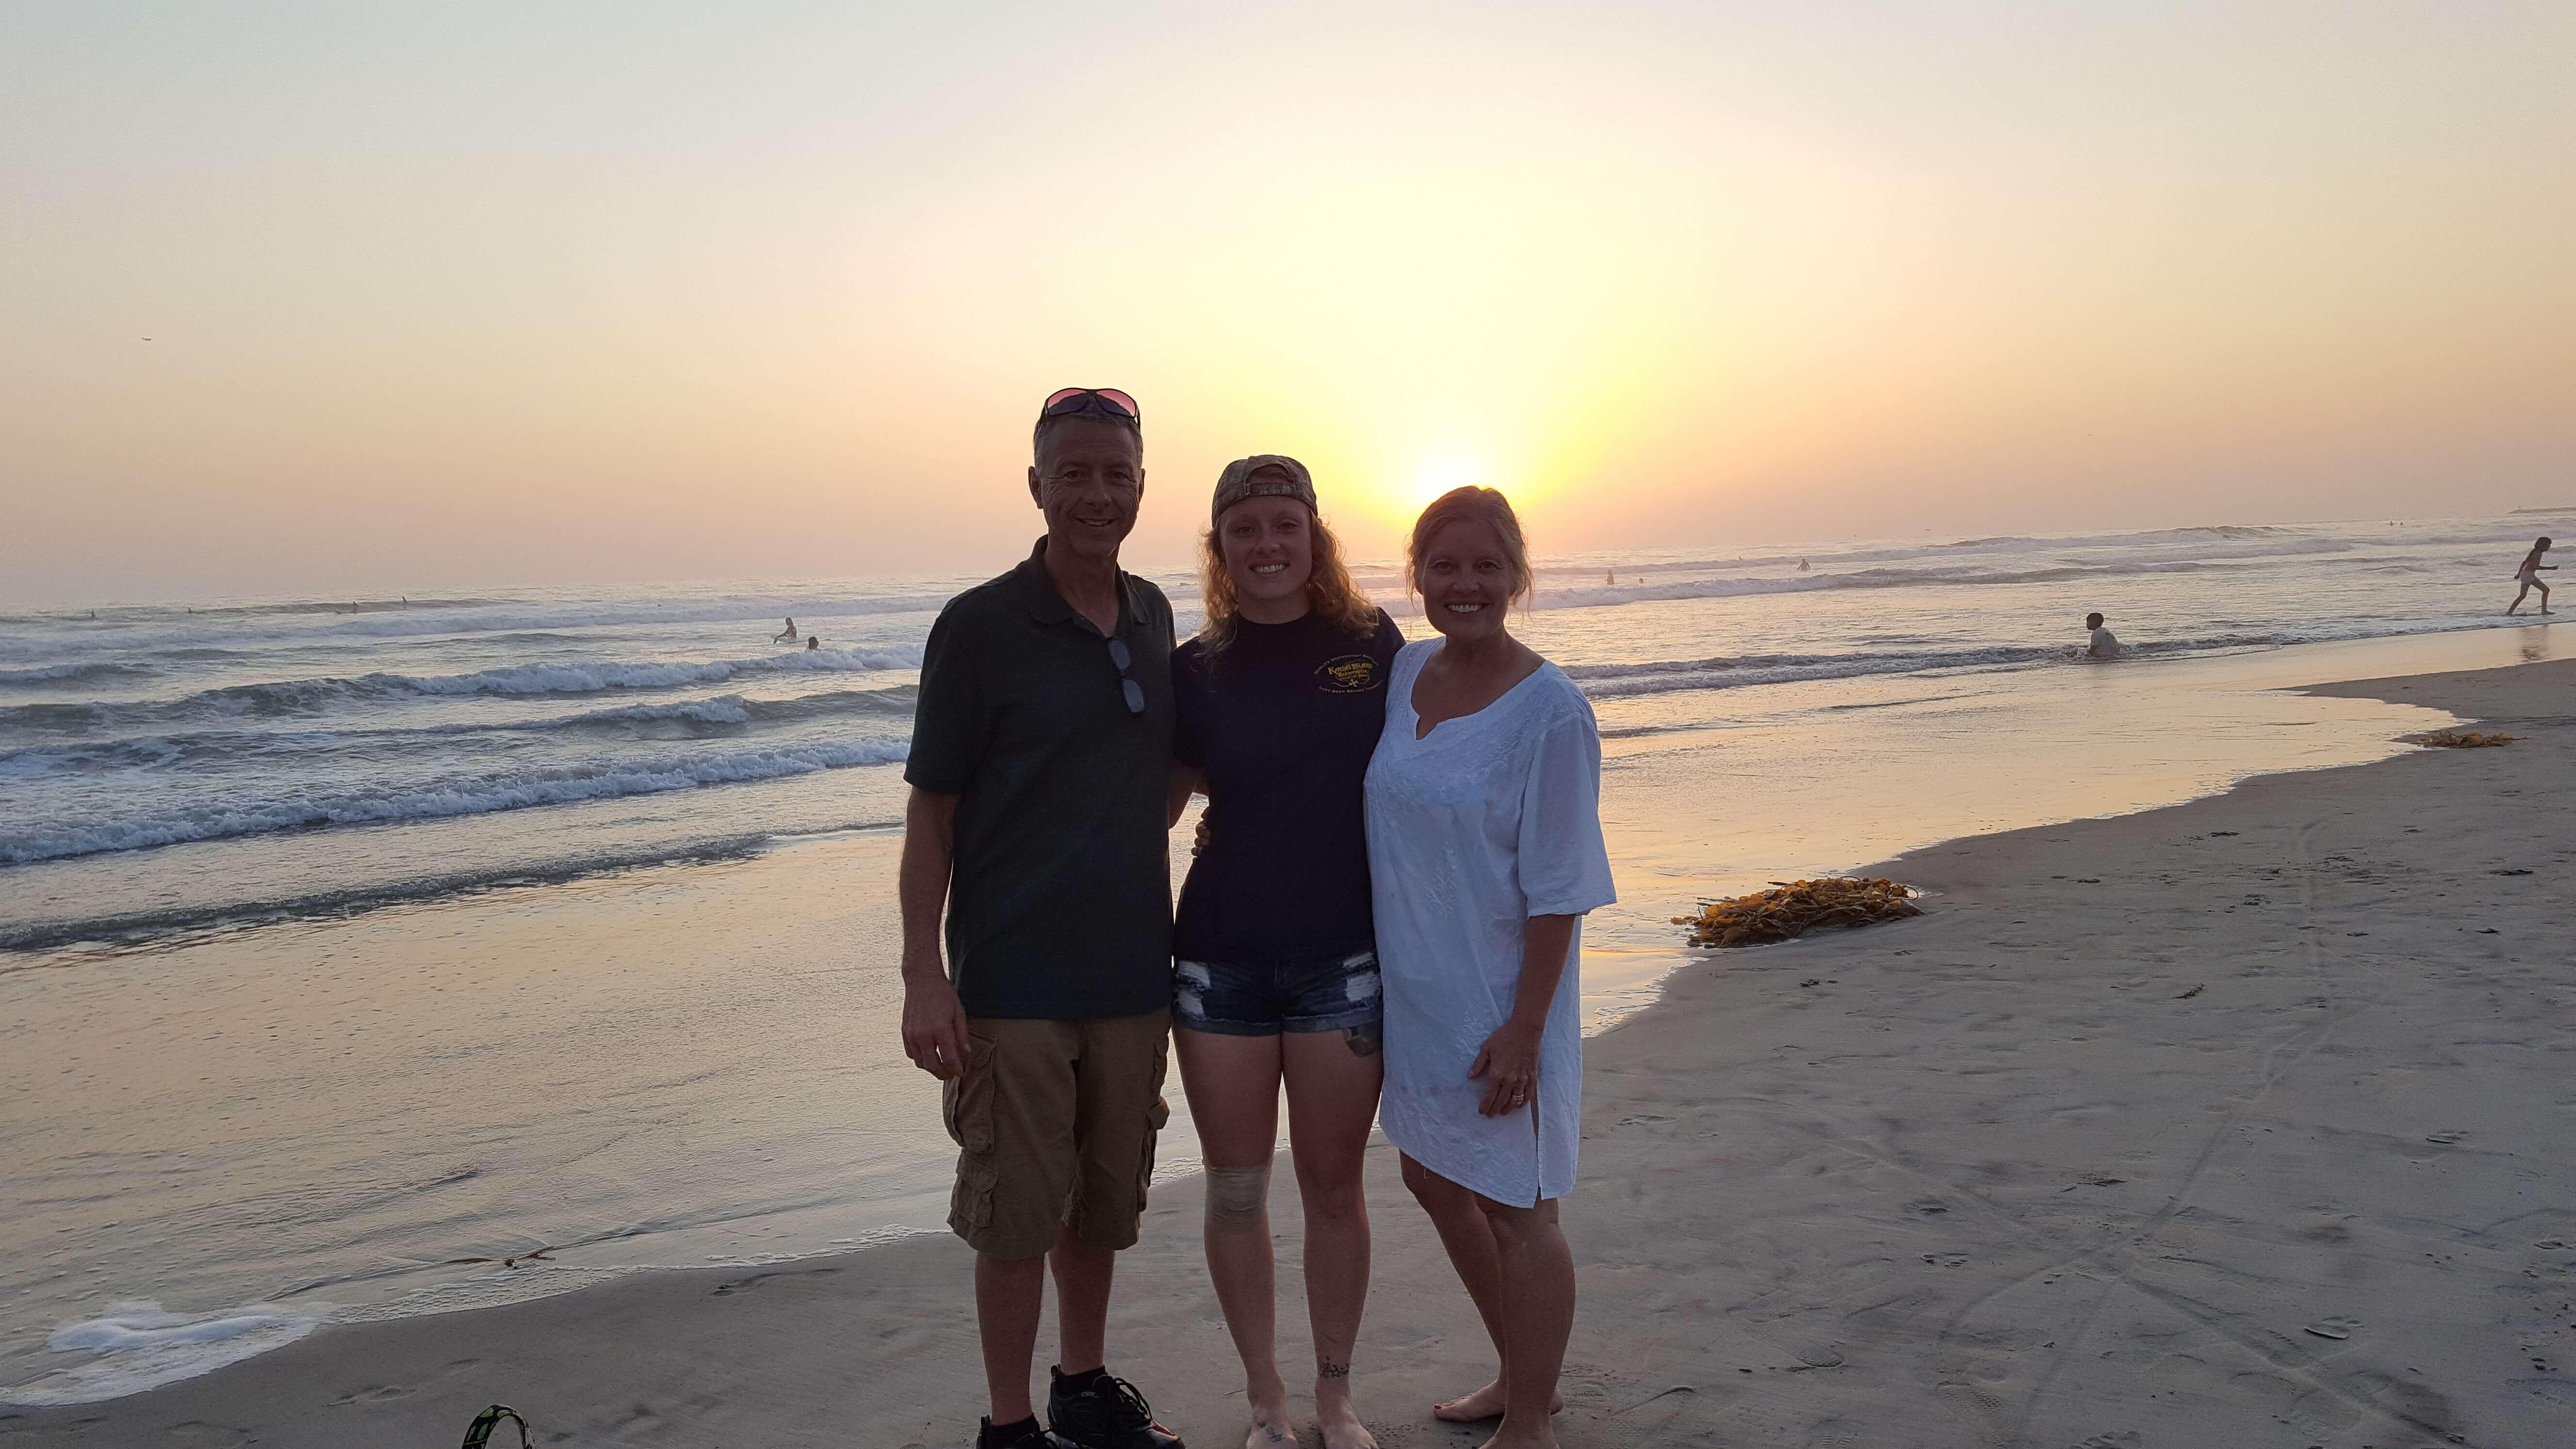 Oceanside beach at sunset